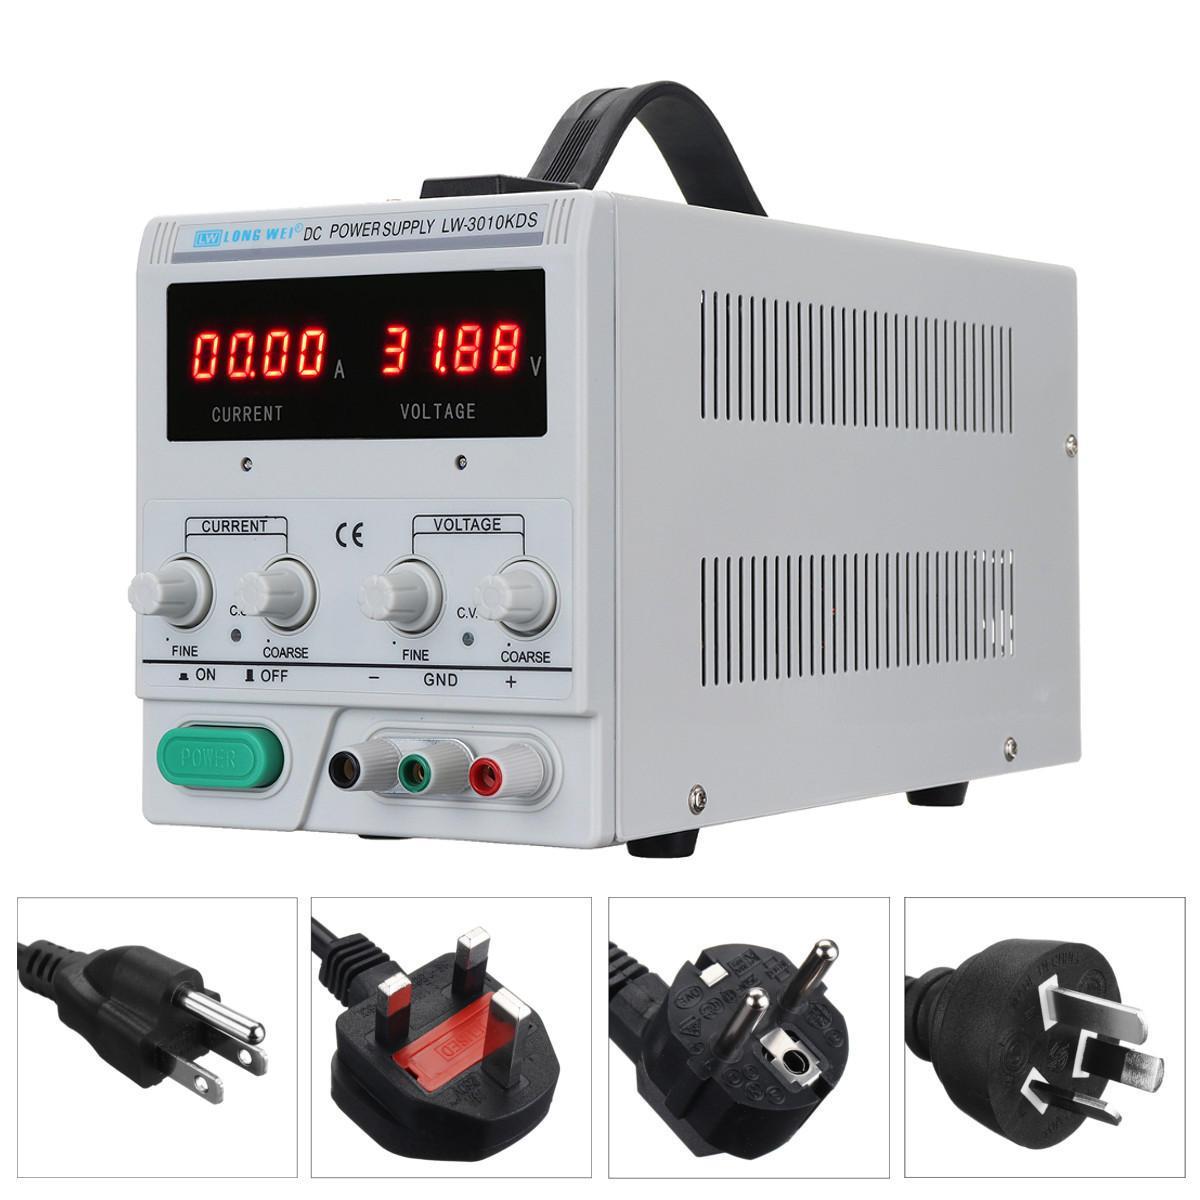 LW-3010KDS Adjustable DC Power Supply 220V/110V 0-30V 0-10A Accuracy 0.01 Dual Display EU/UK/AU/US